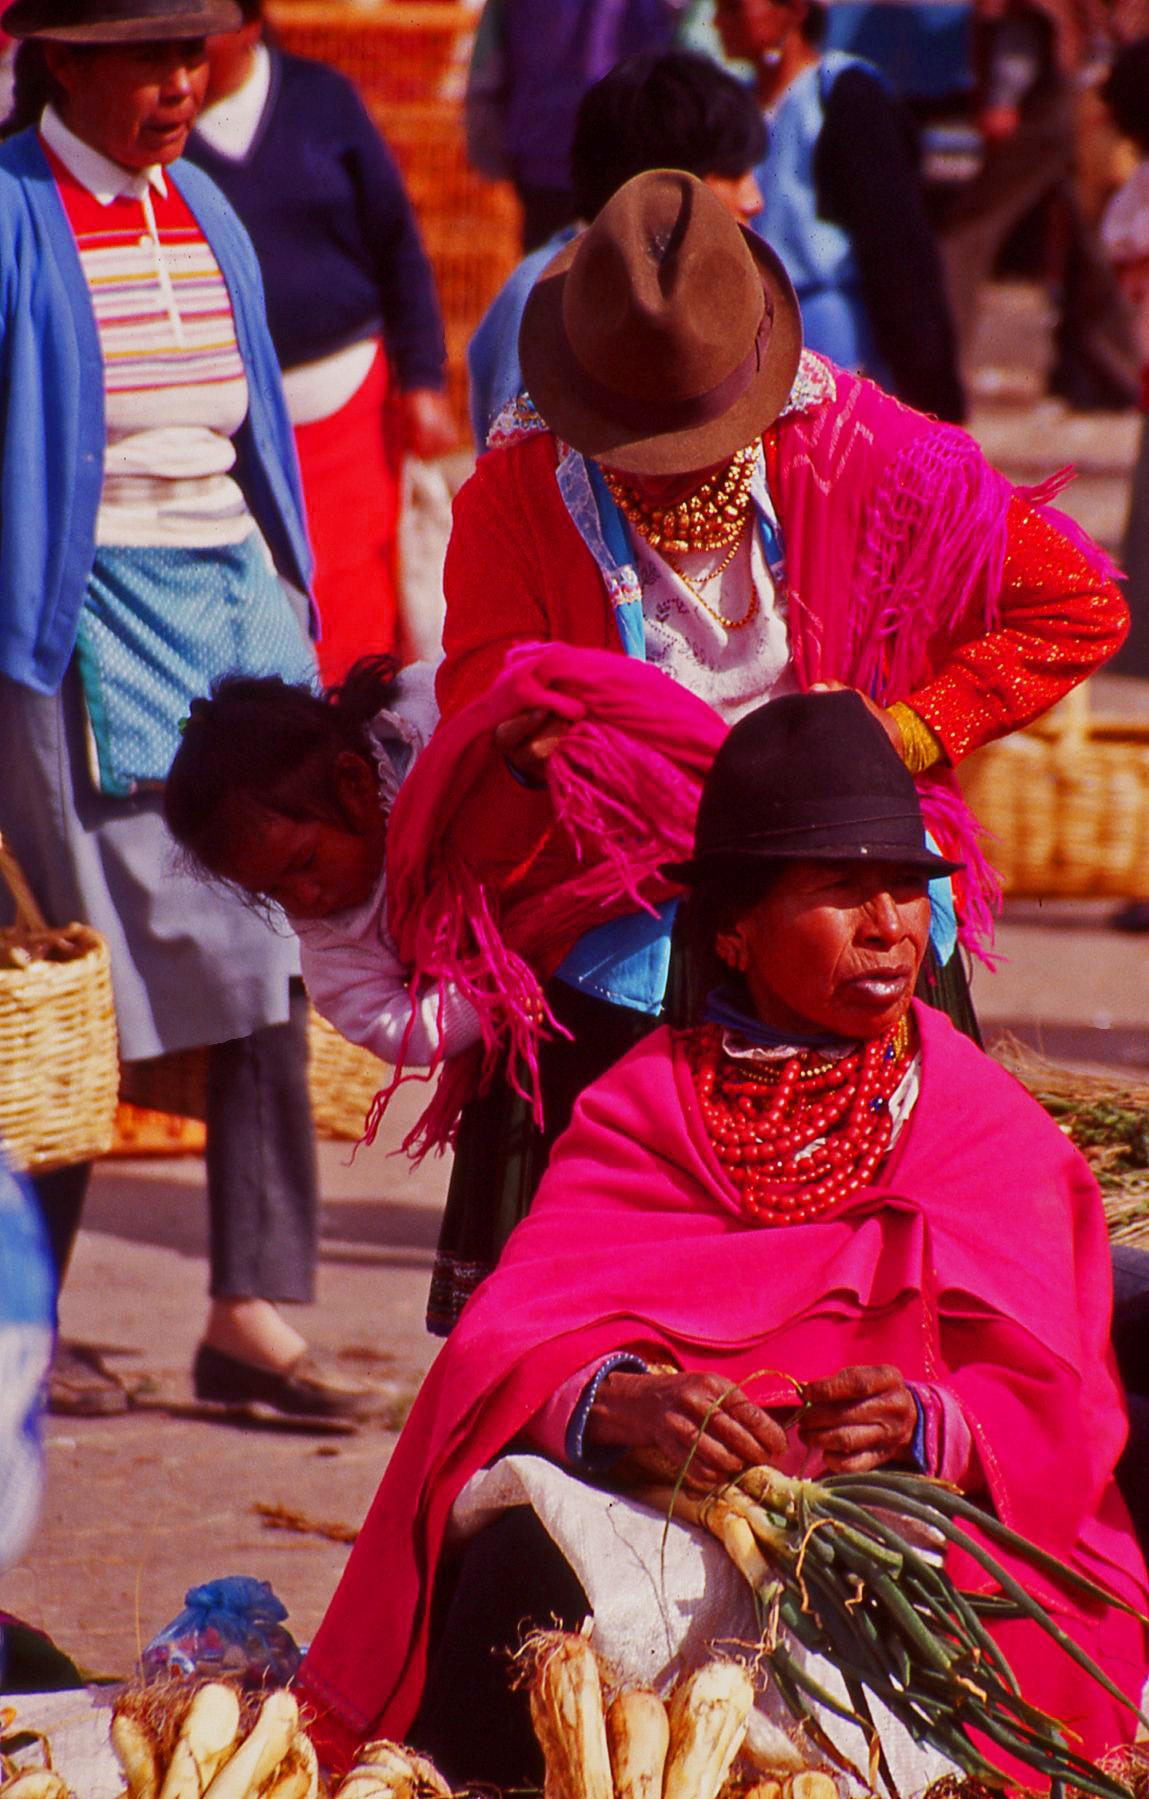 Market ladies Ecuador © JonoVernon-Powell